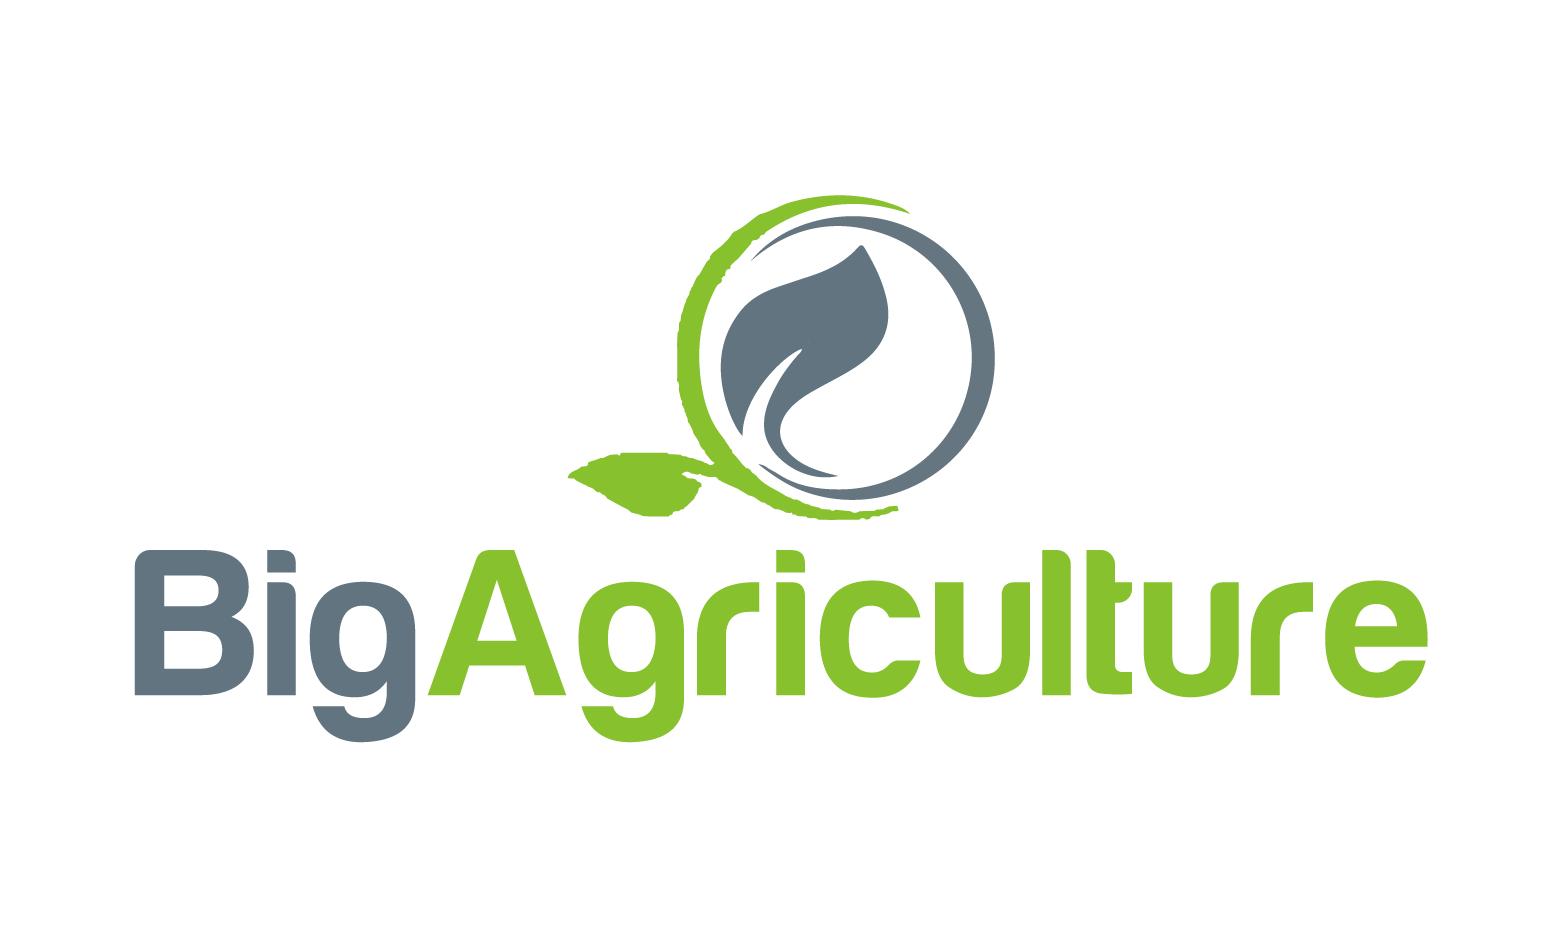 BigAgriculture.com